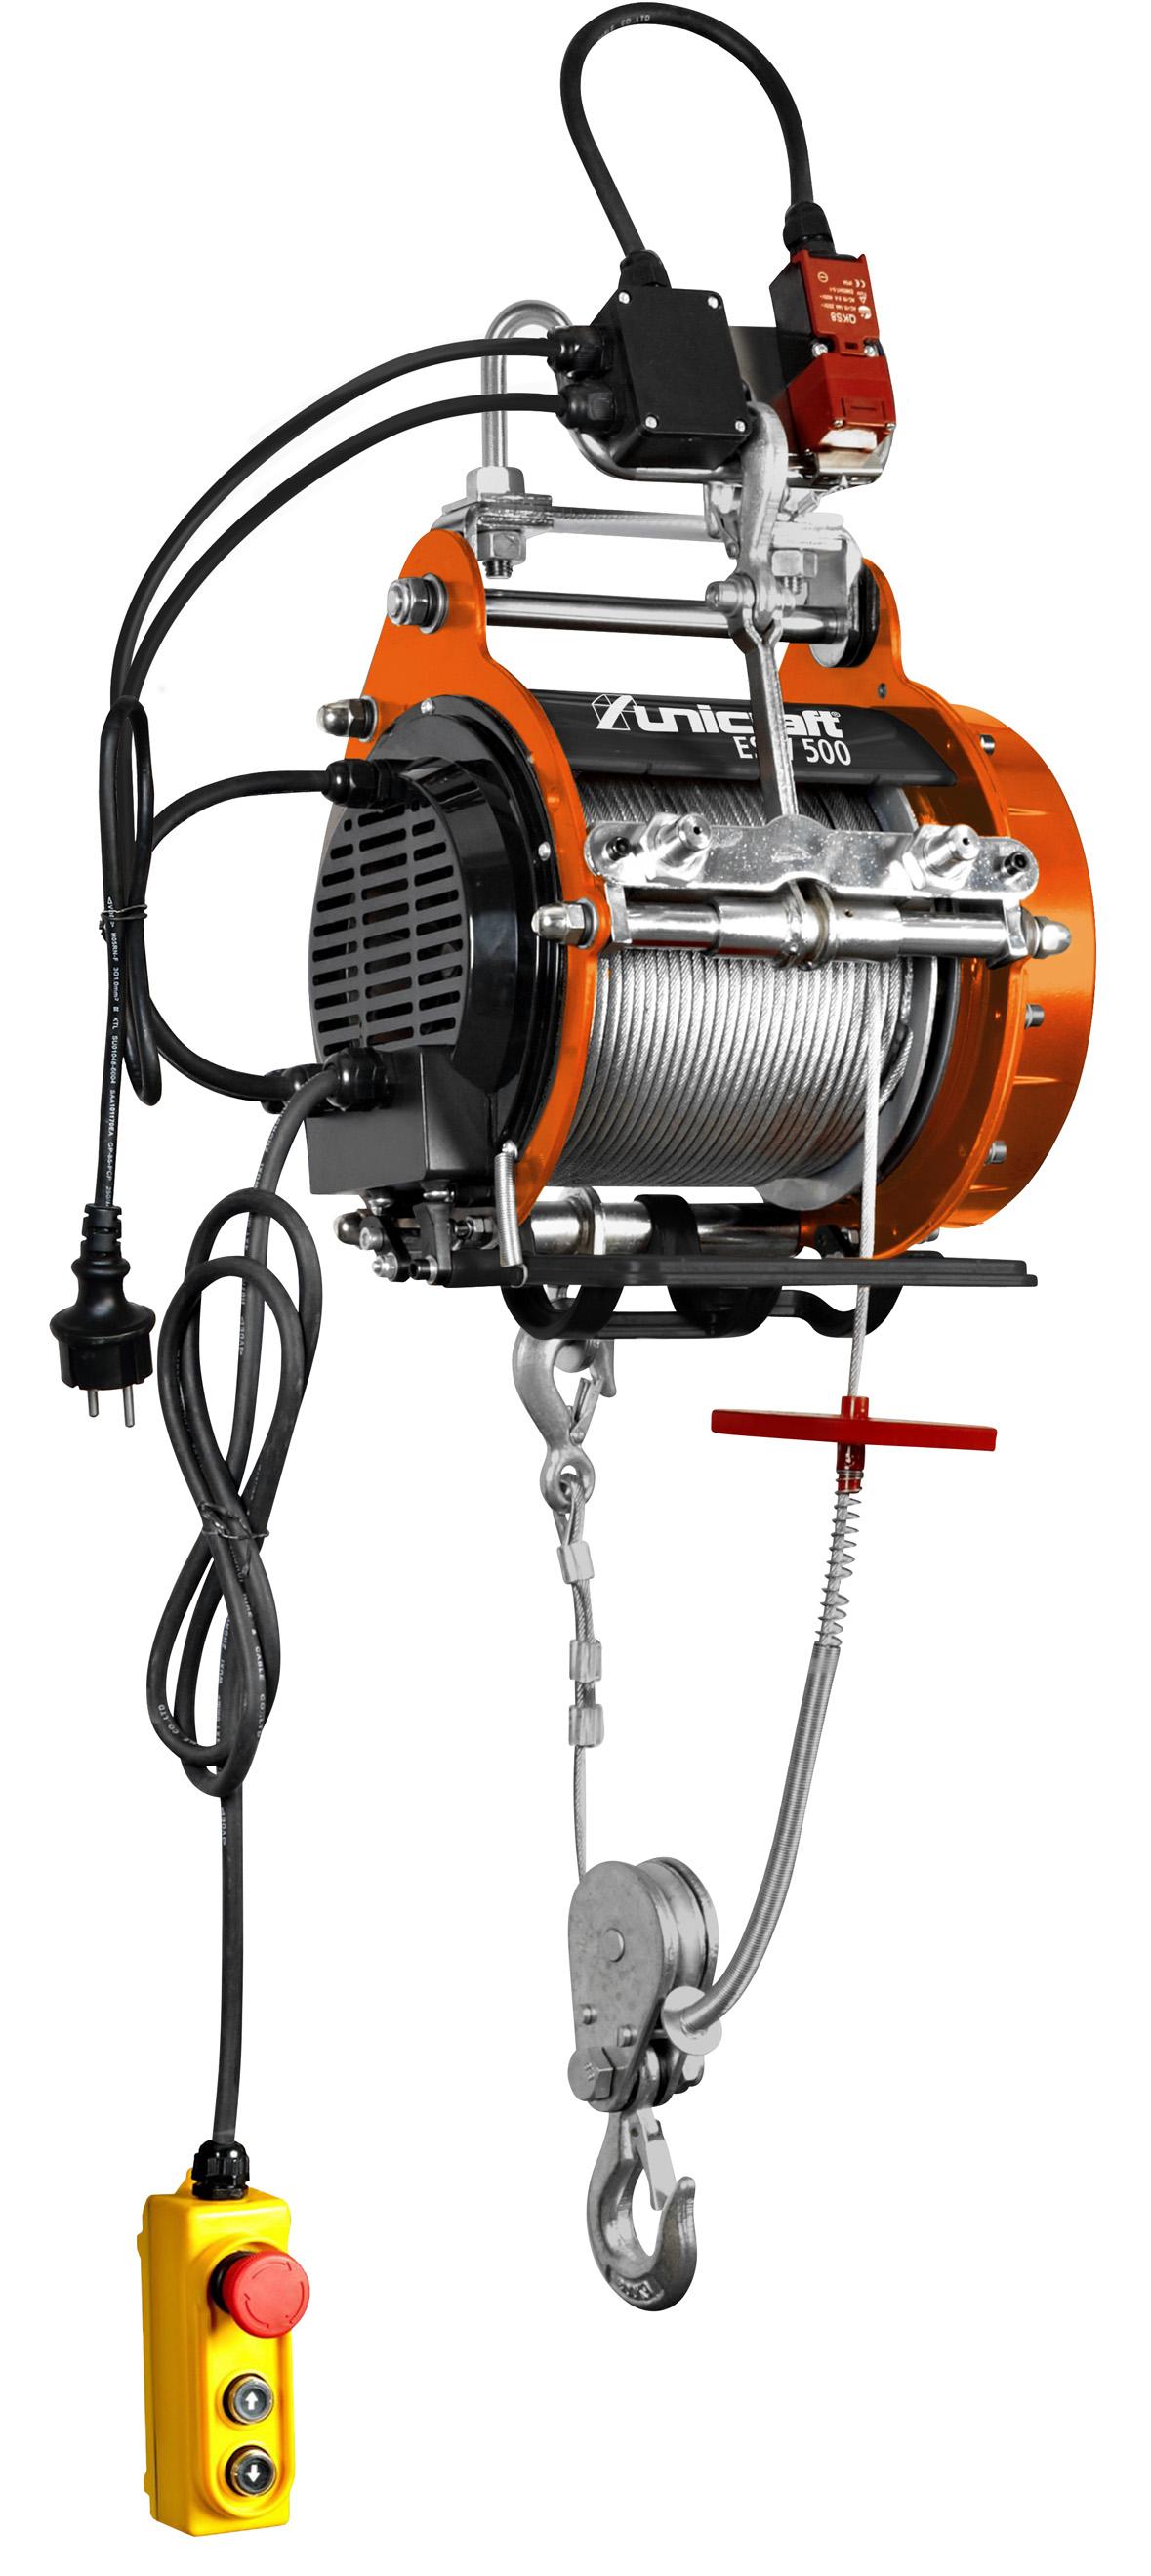 unicraft esw 500 elektrische seilwinde 6199500 dittmar. Black Bedroom Furniture Sets. Home Design Ideas